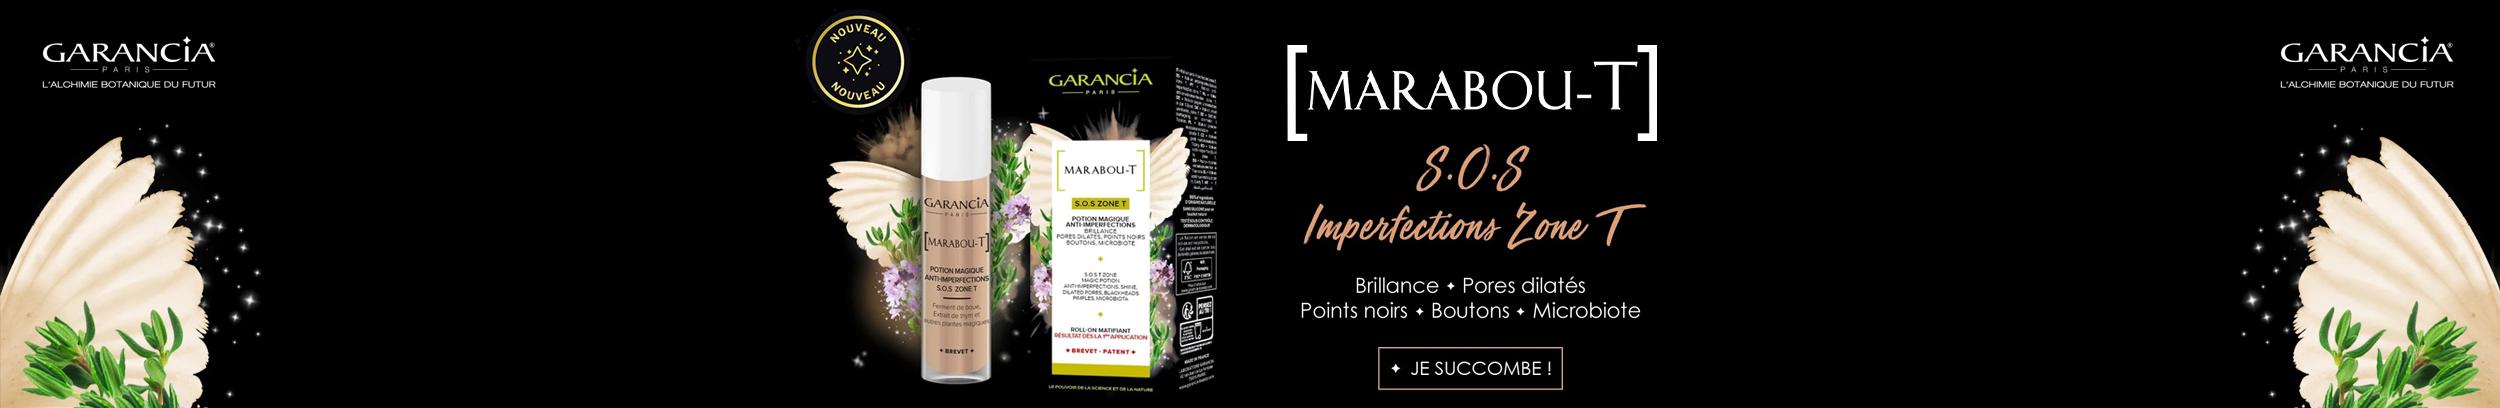 Garancia Marabou-T